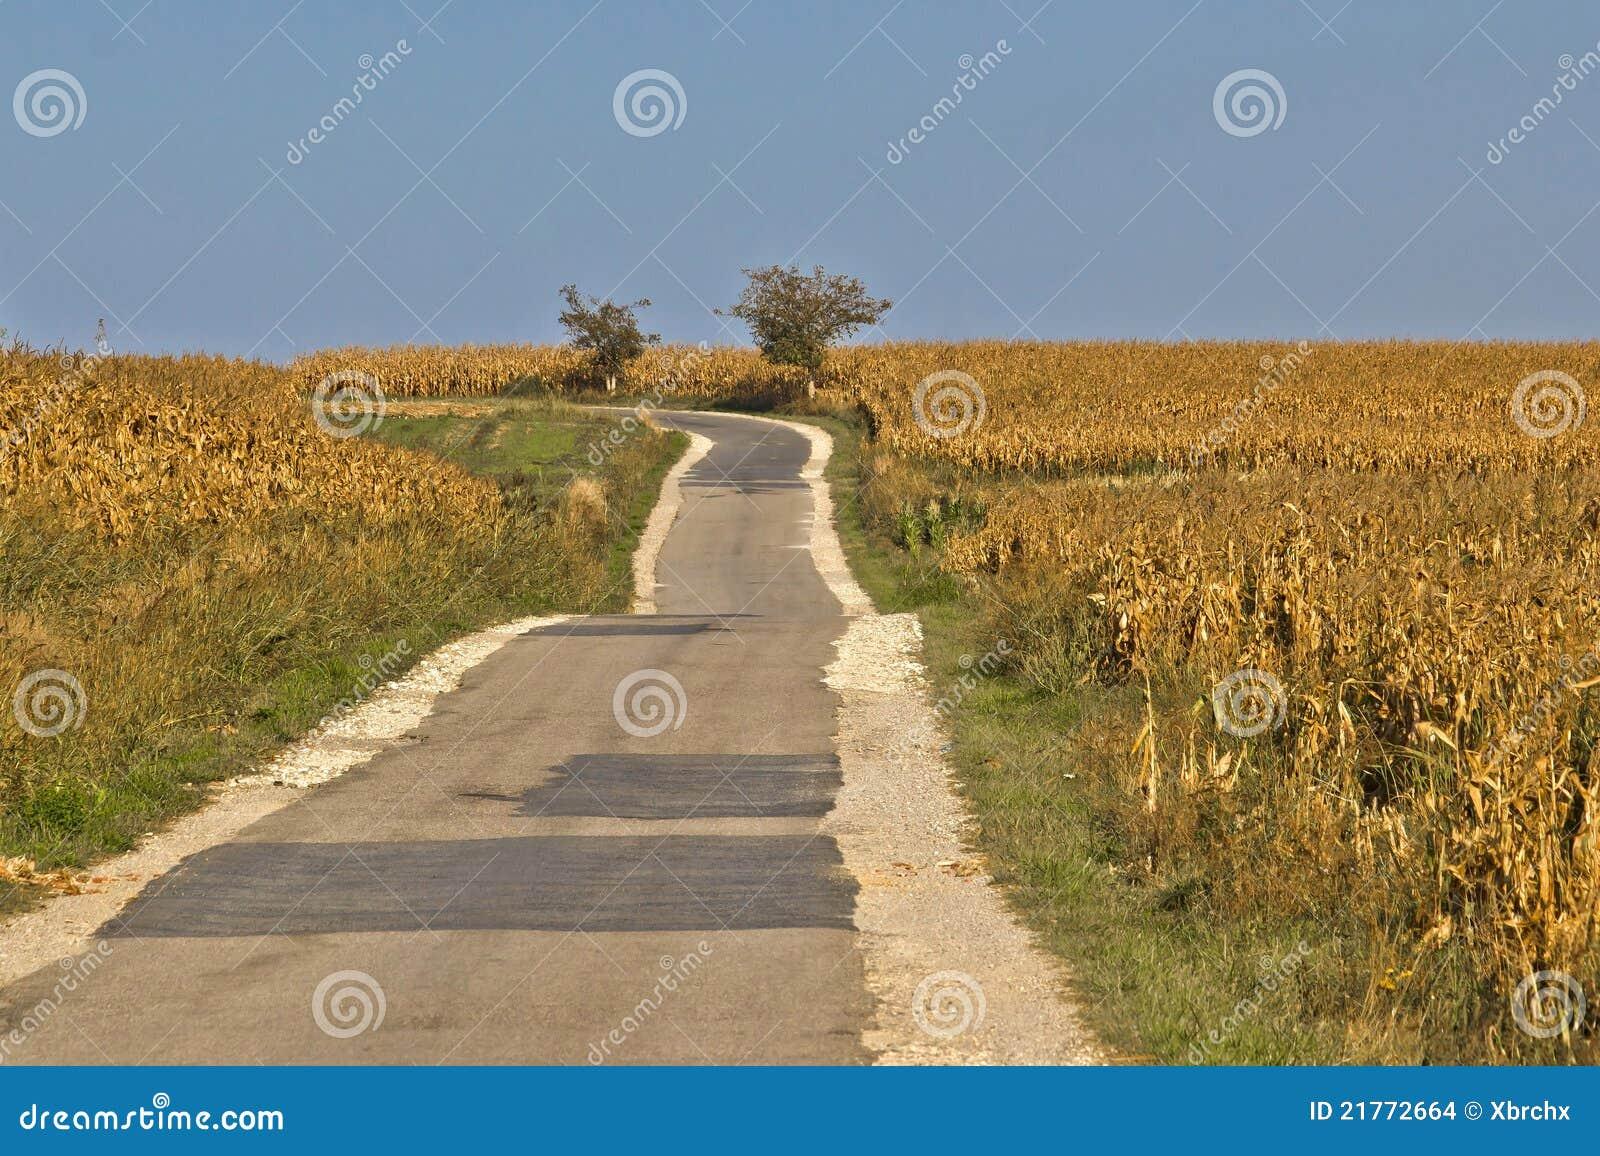 Beautiful countryside road through cornfields